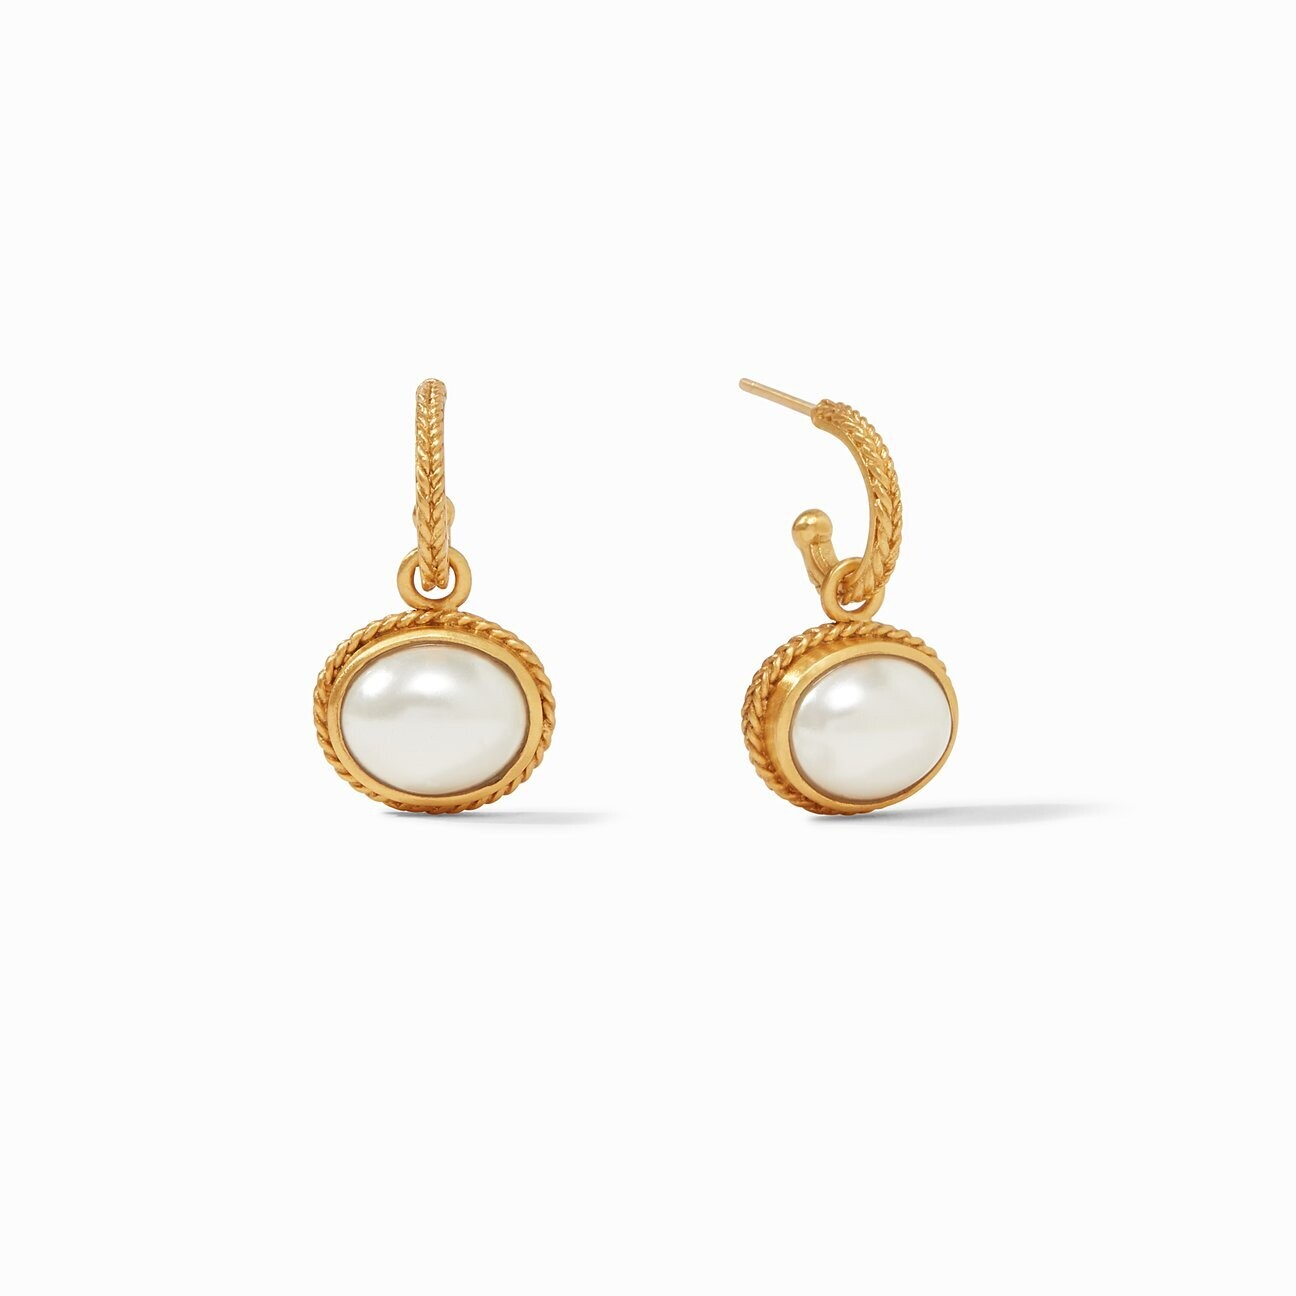 JULIE VOS Calypso Hoop and Charm Earring